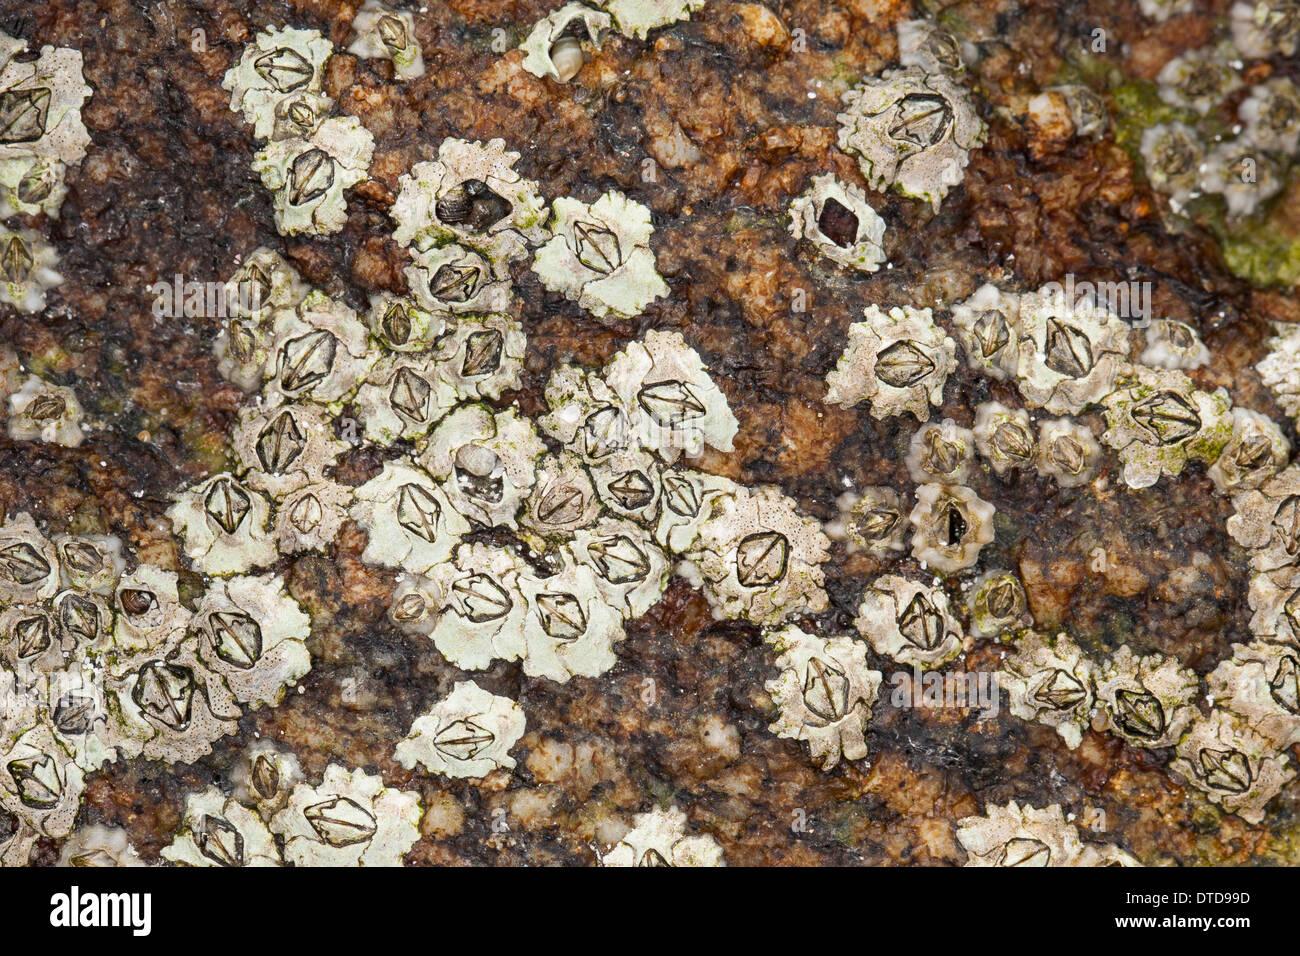 New Zealand barnacle, Australasian barnacle, Elminius modestus, Austrominius modestus, Australische Seepocke, Australseepocke Stock Photo